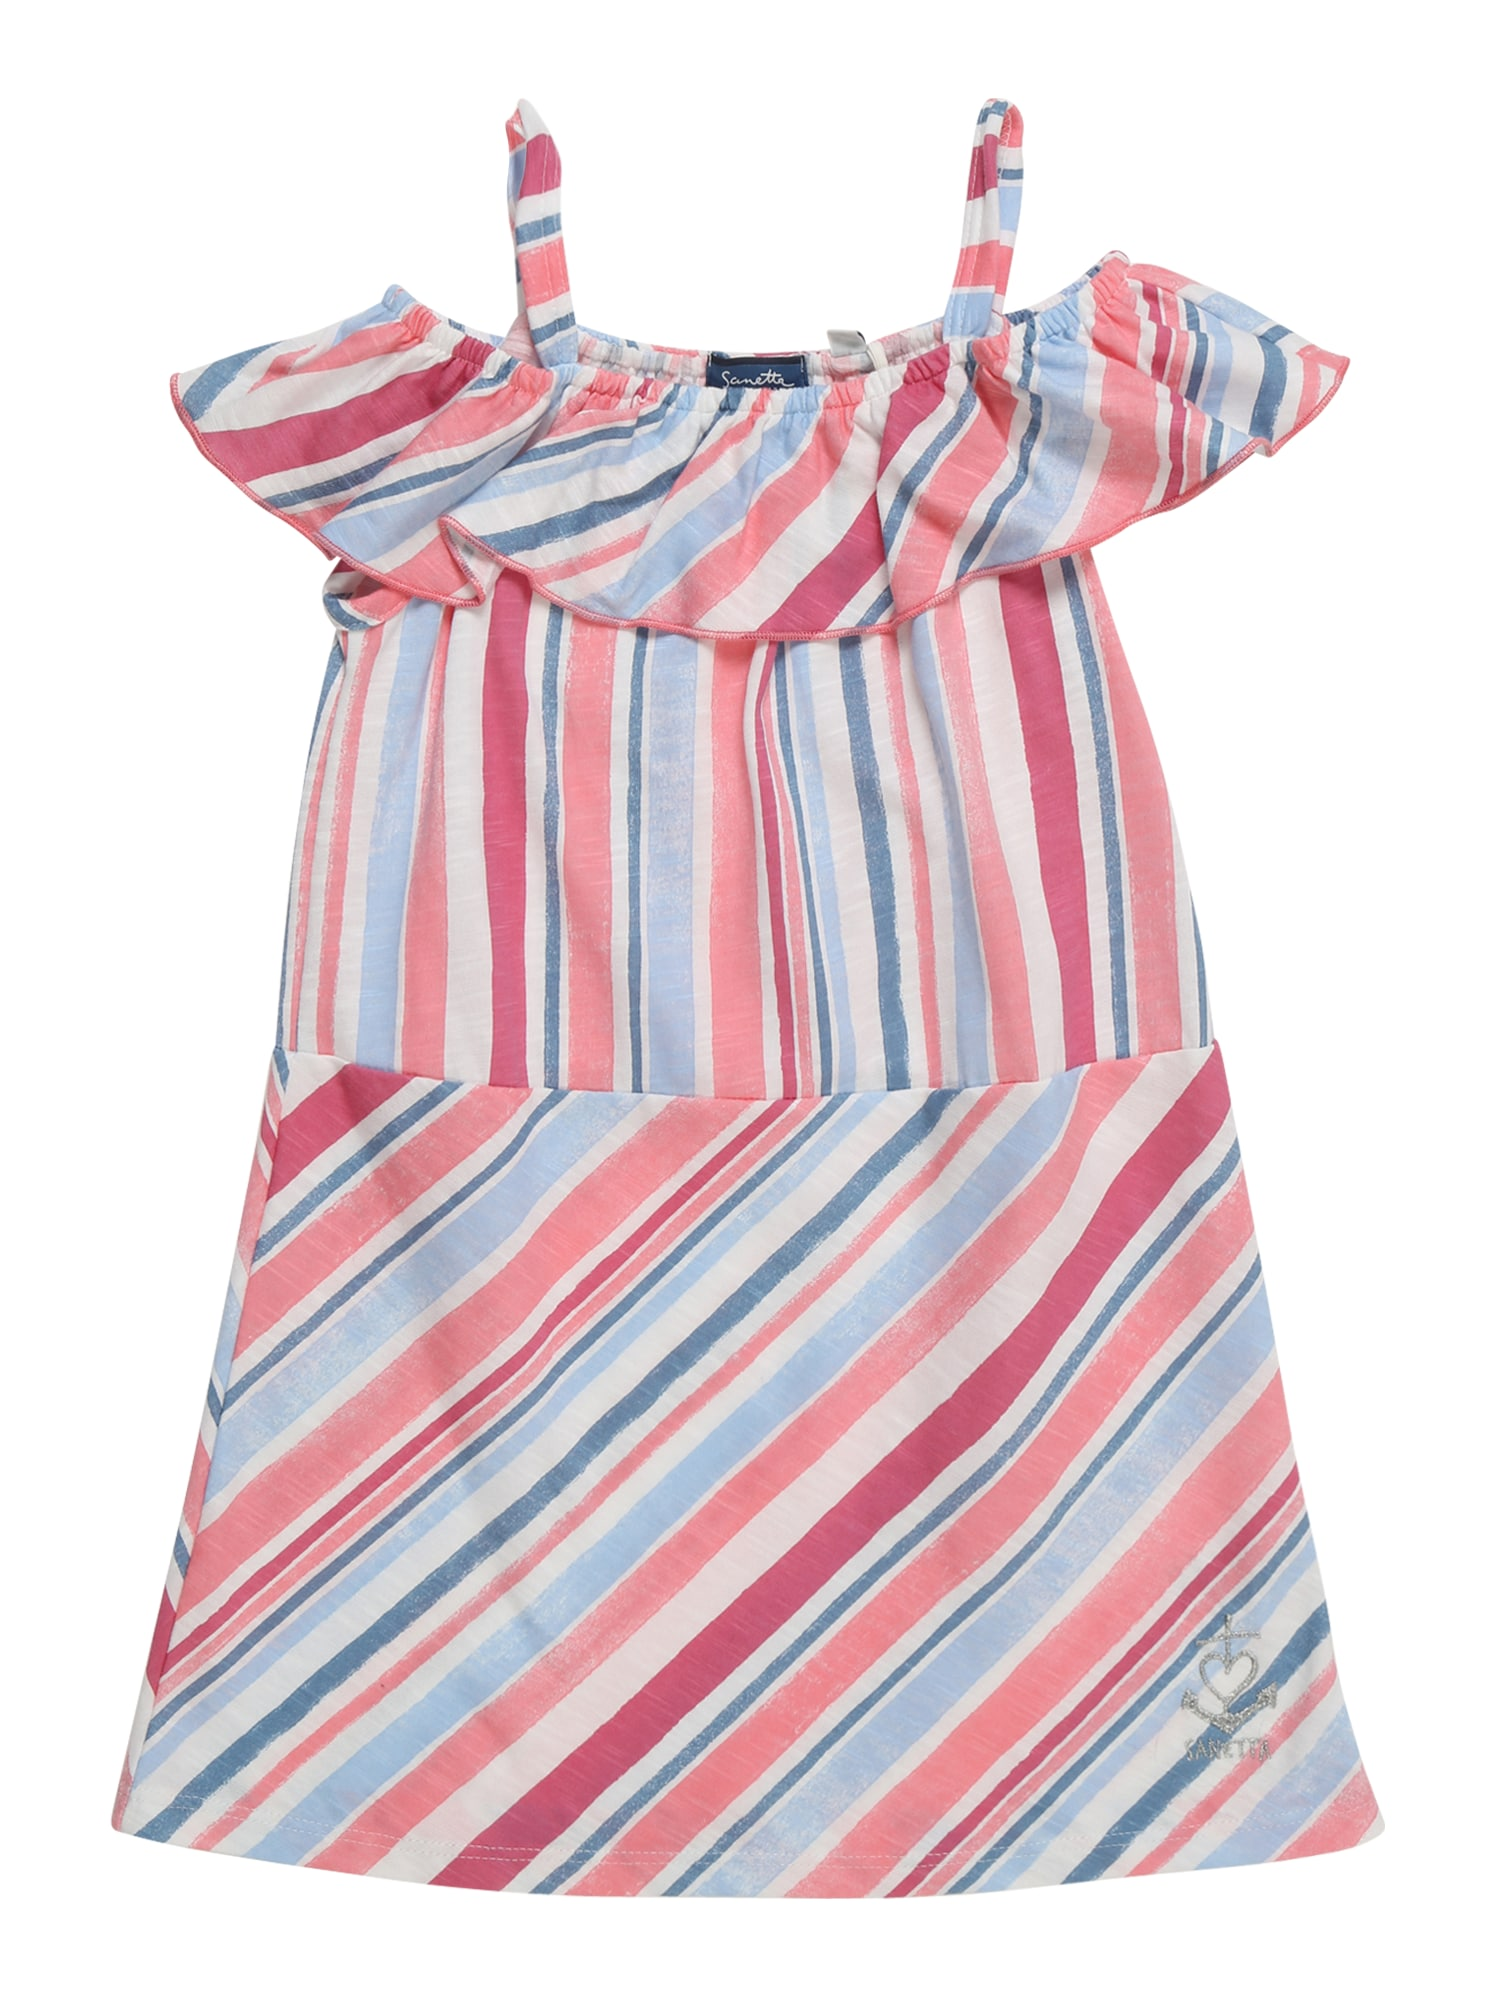 Šaty světlemodrá růžová Sanetta Kidswear